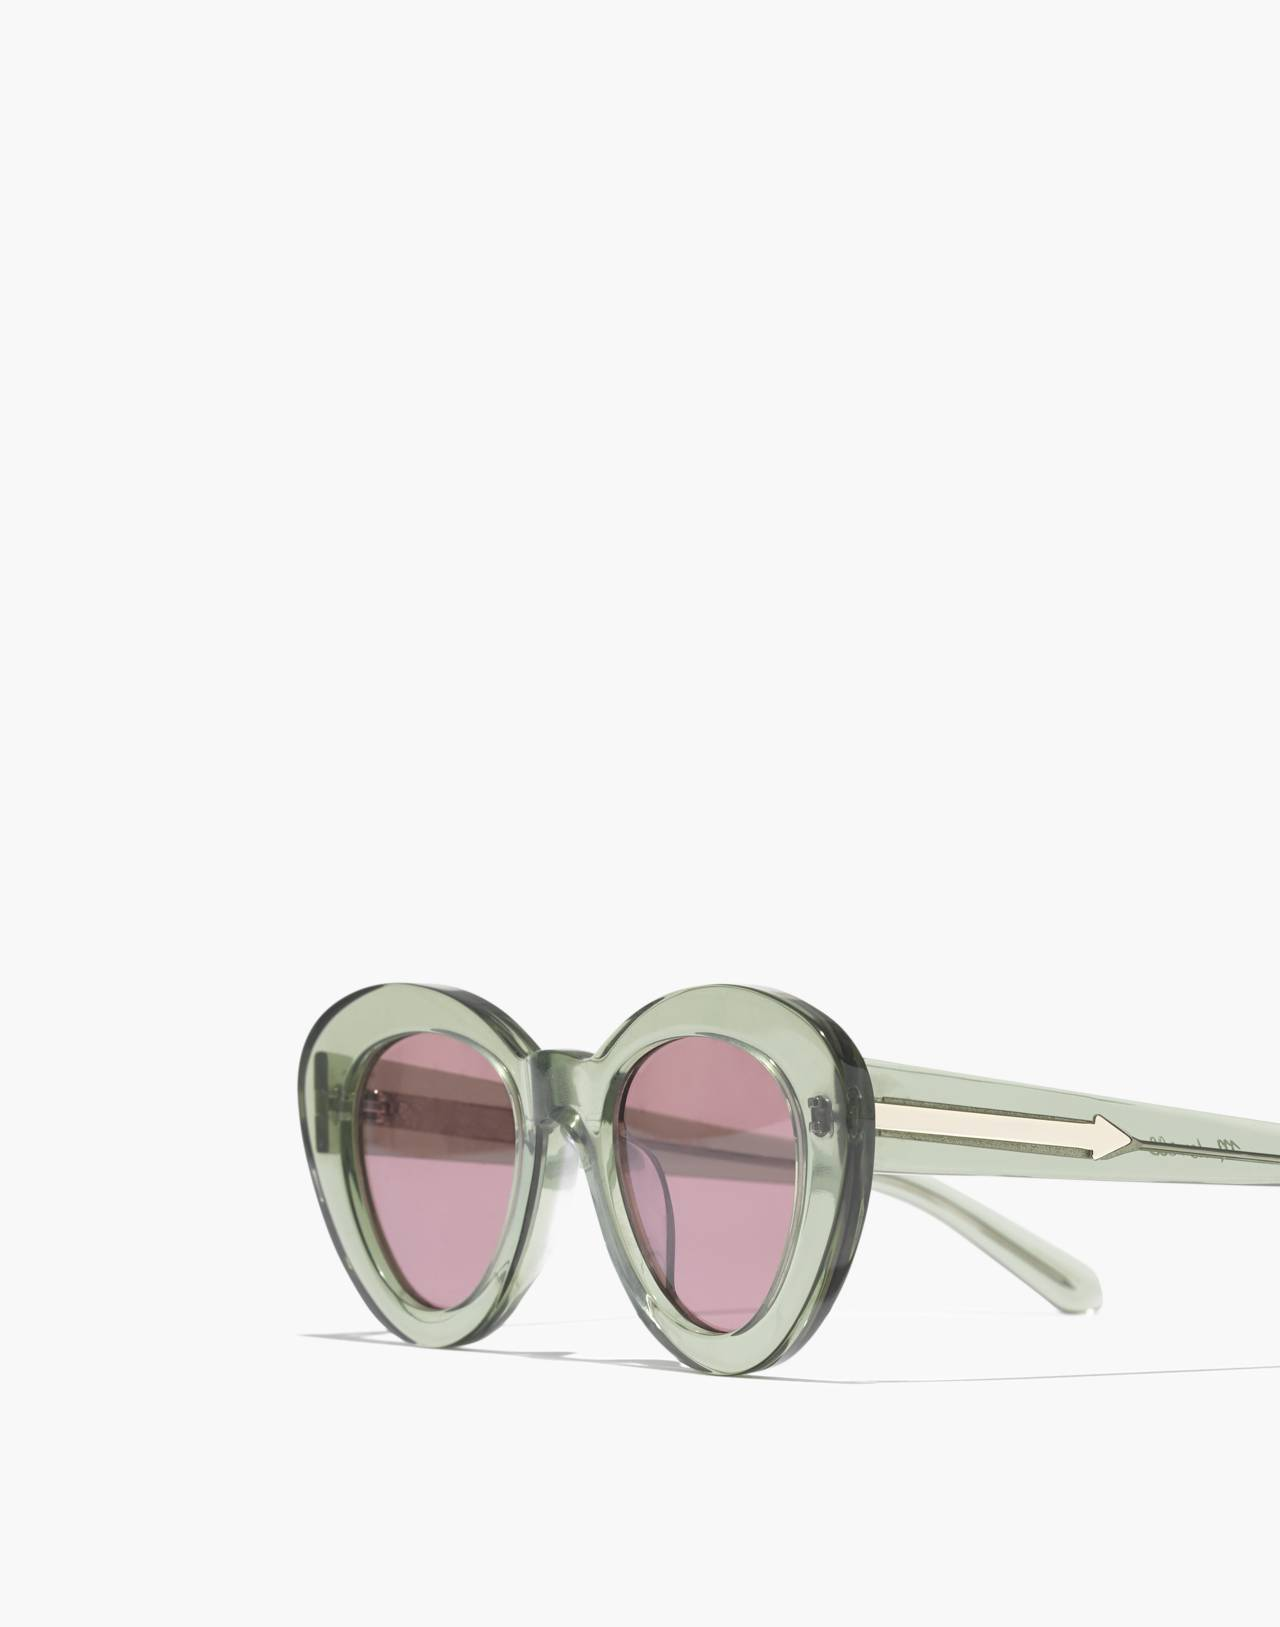 Madewell x Karen Walker® Argentina Sunglasses in crystal khaki image 2